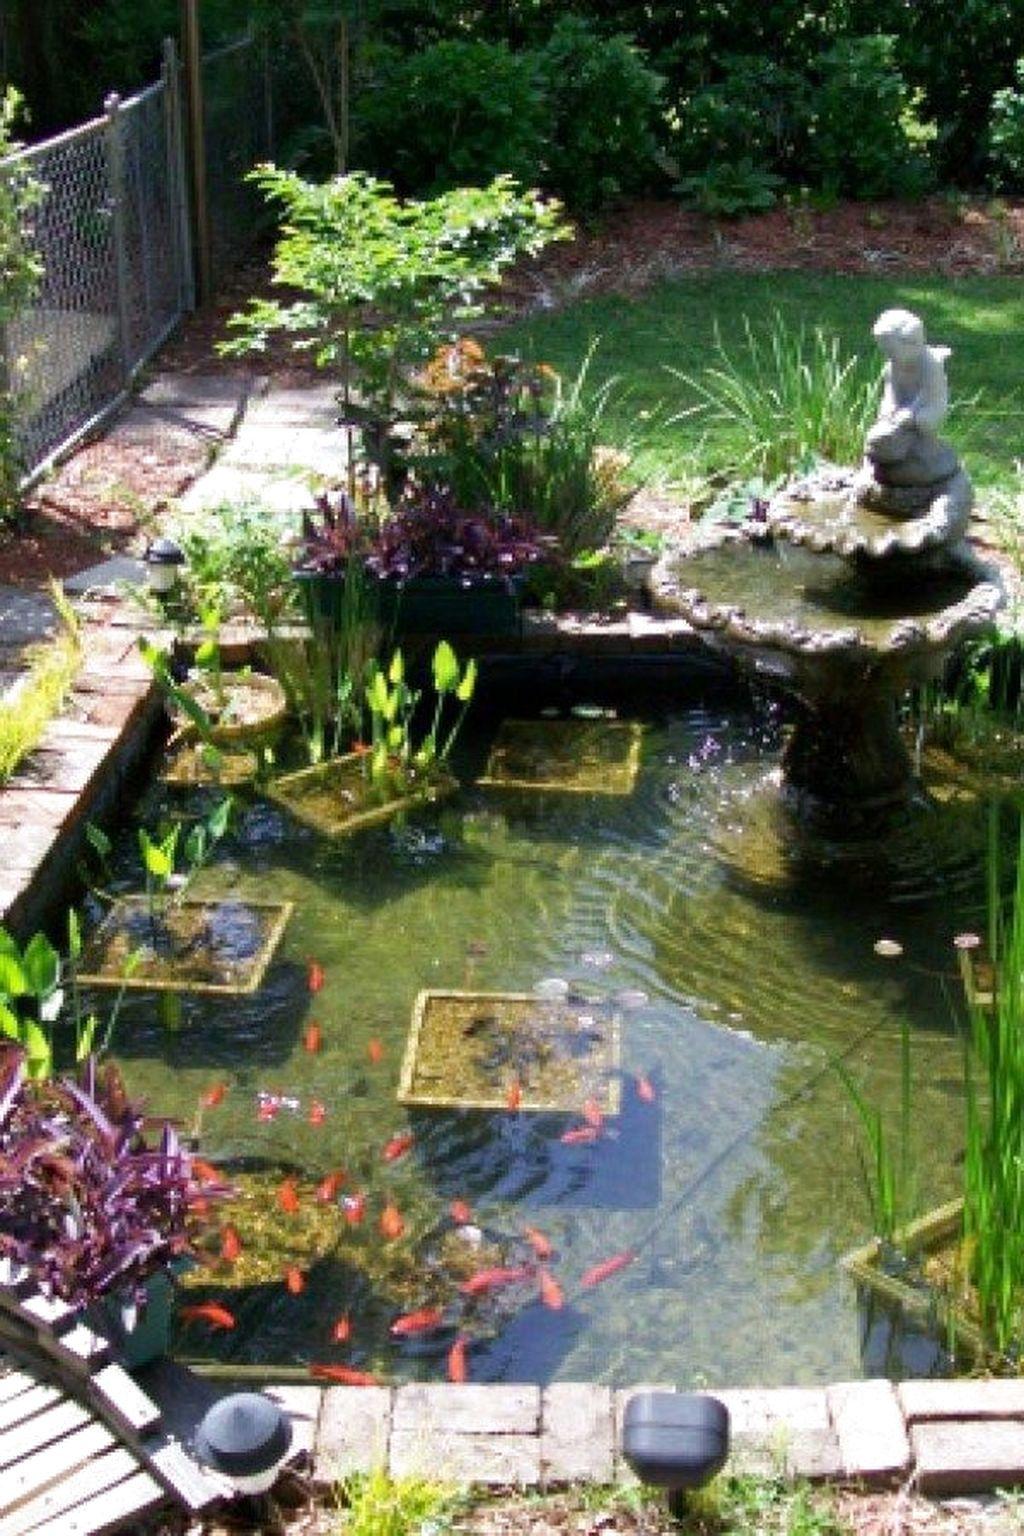 45 Favourite Pond Garden Ideas For Beautiful Backyard Pondgarden Gardenideas Backyardgarden Ponds Backyard Garden Pond Design Fish Pond Gardens